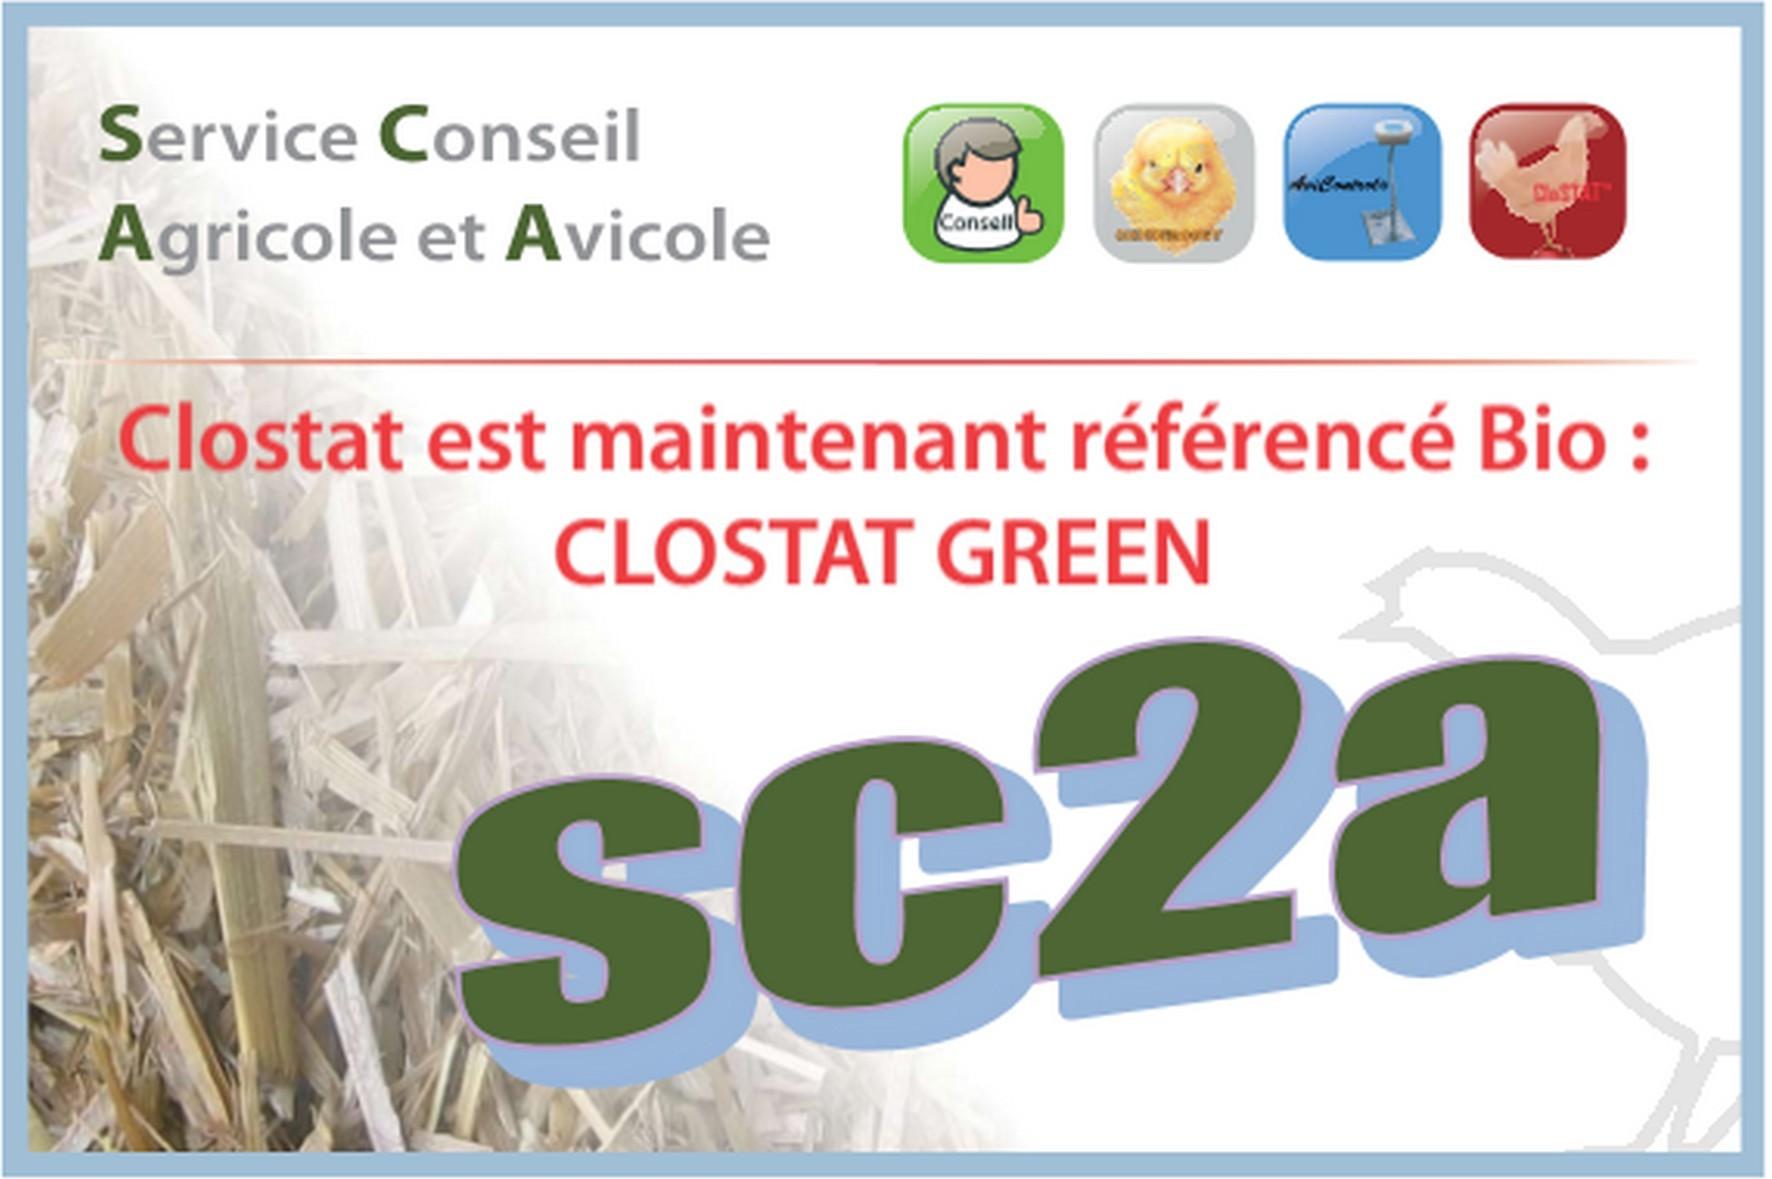 clostat green